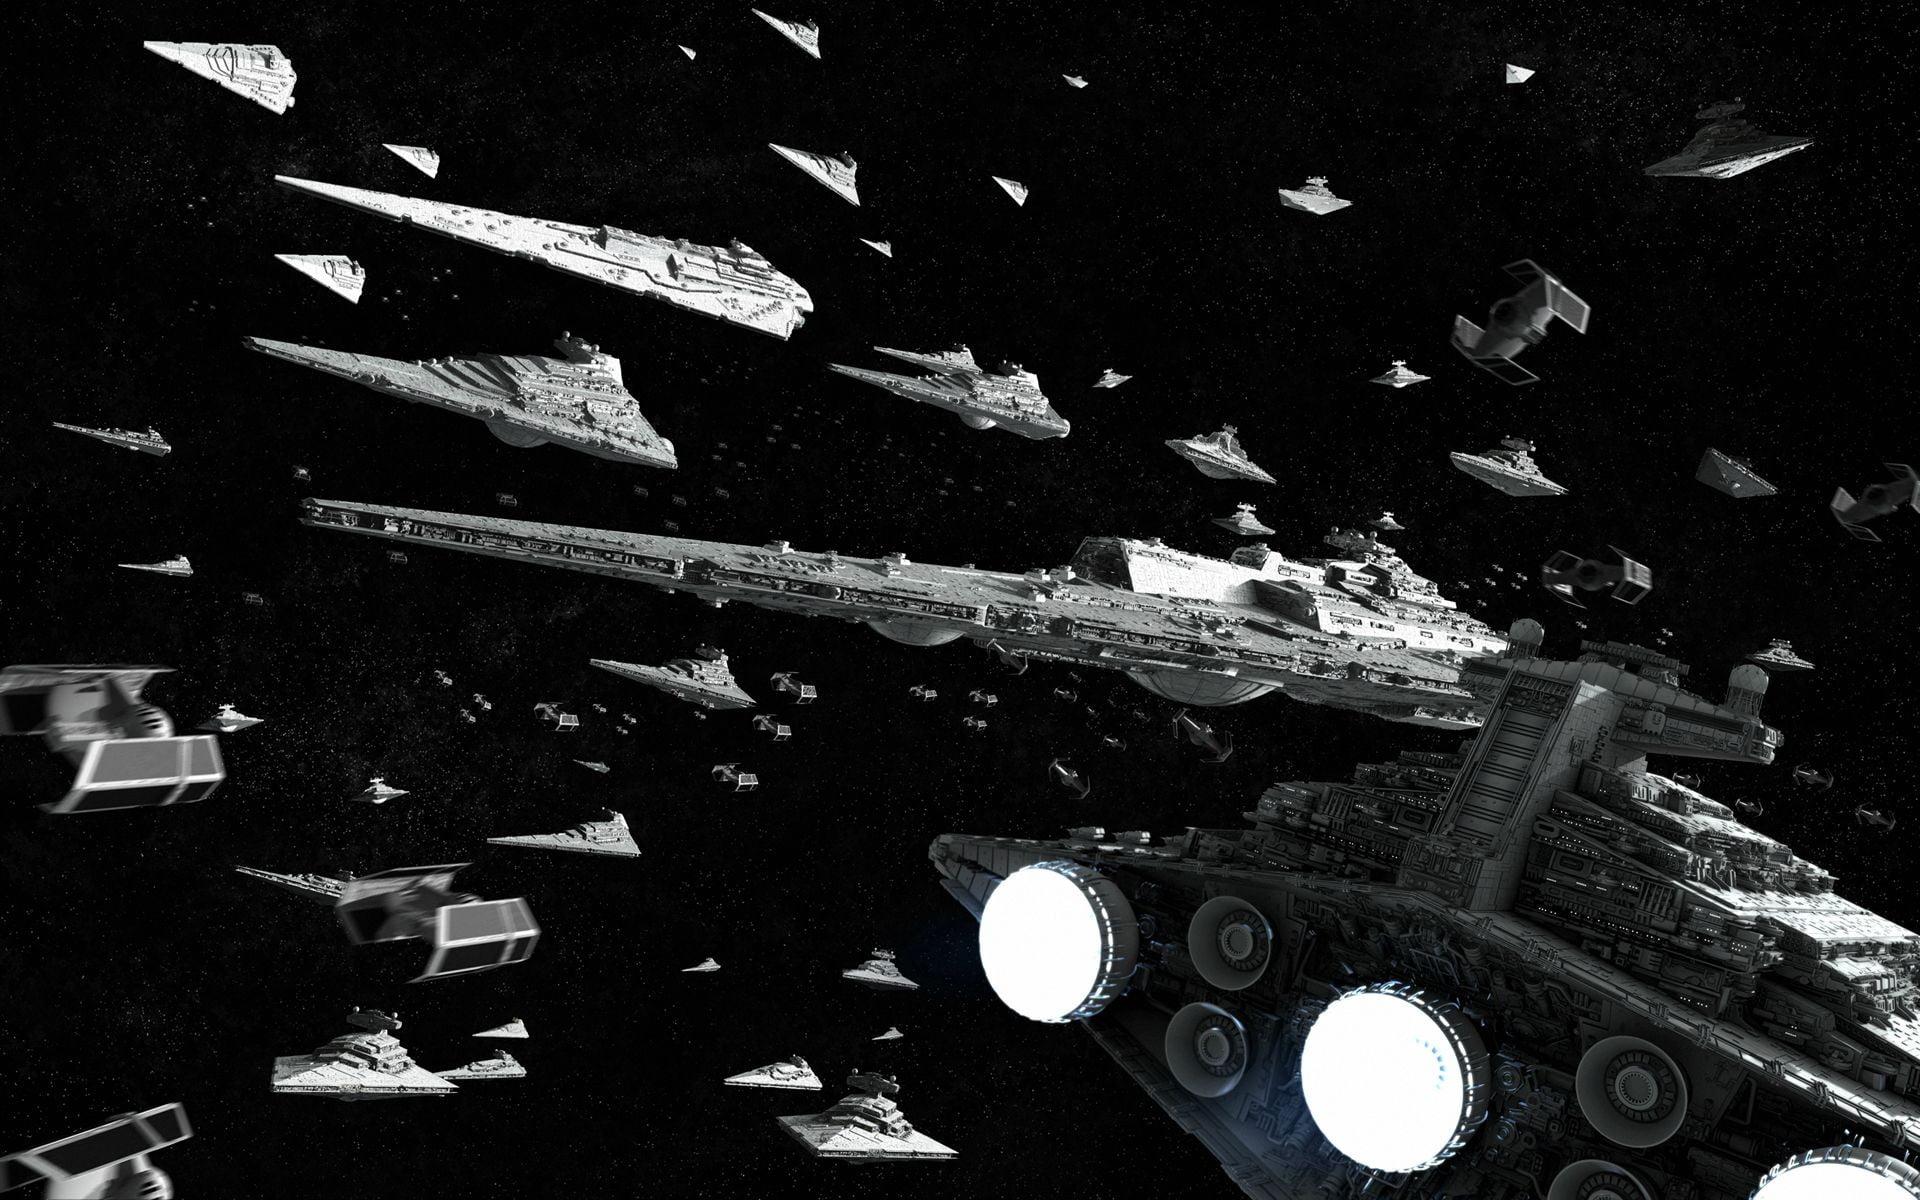 Gray space ships, Star Wars HD wallpaper Wallpaper Flare